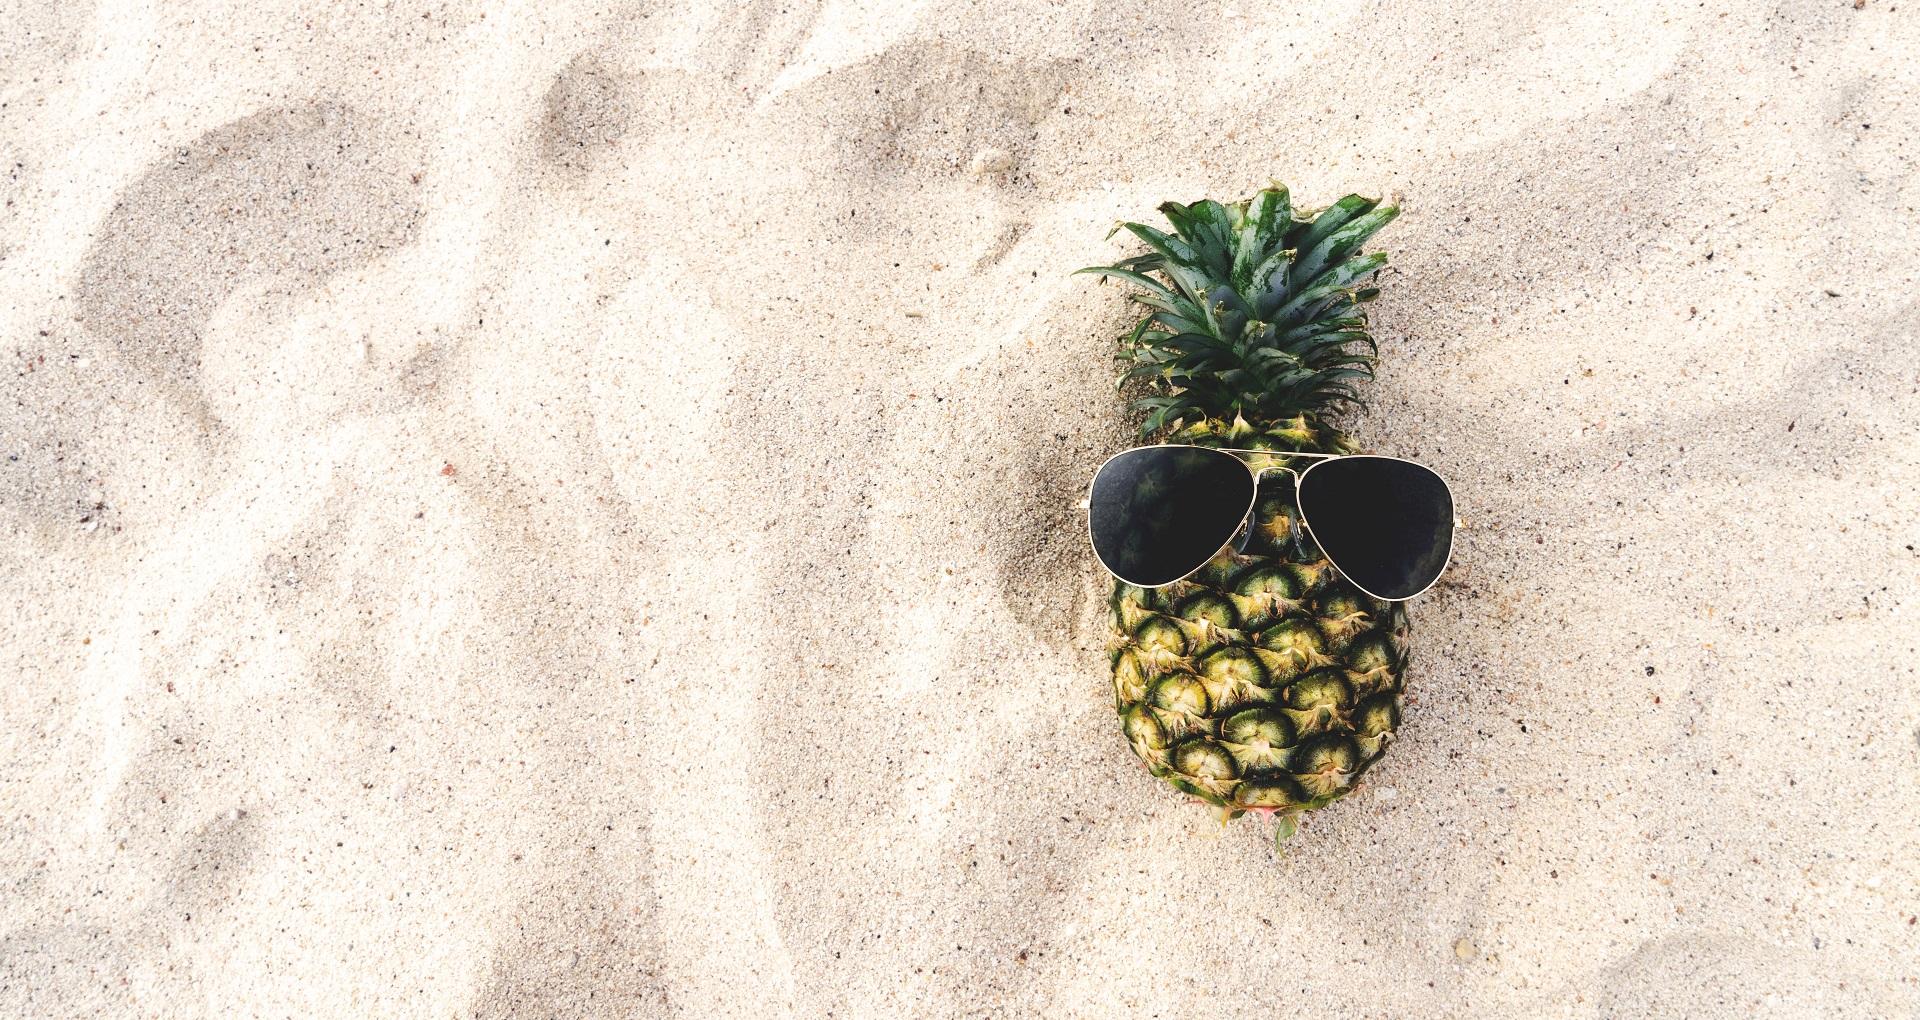 Ananas op het strand